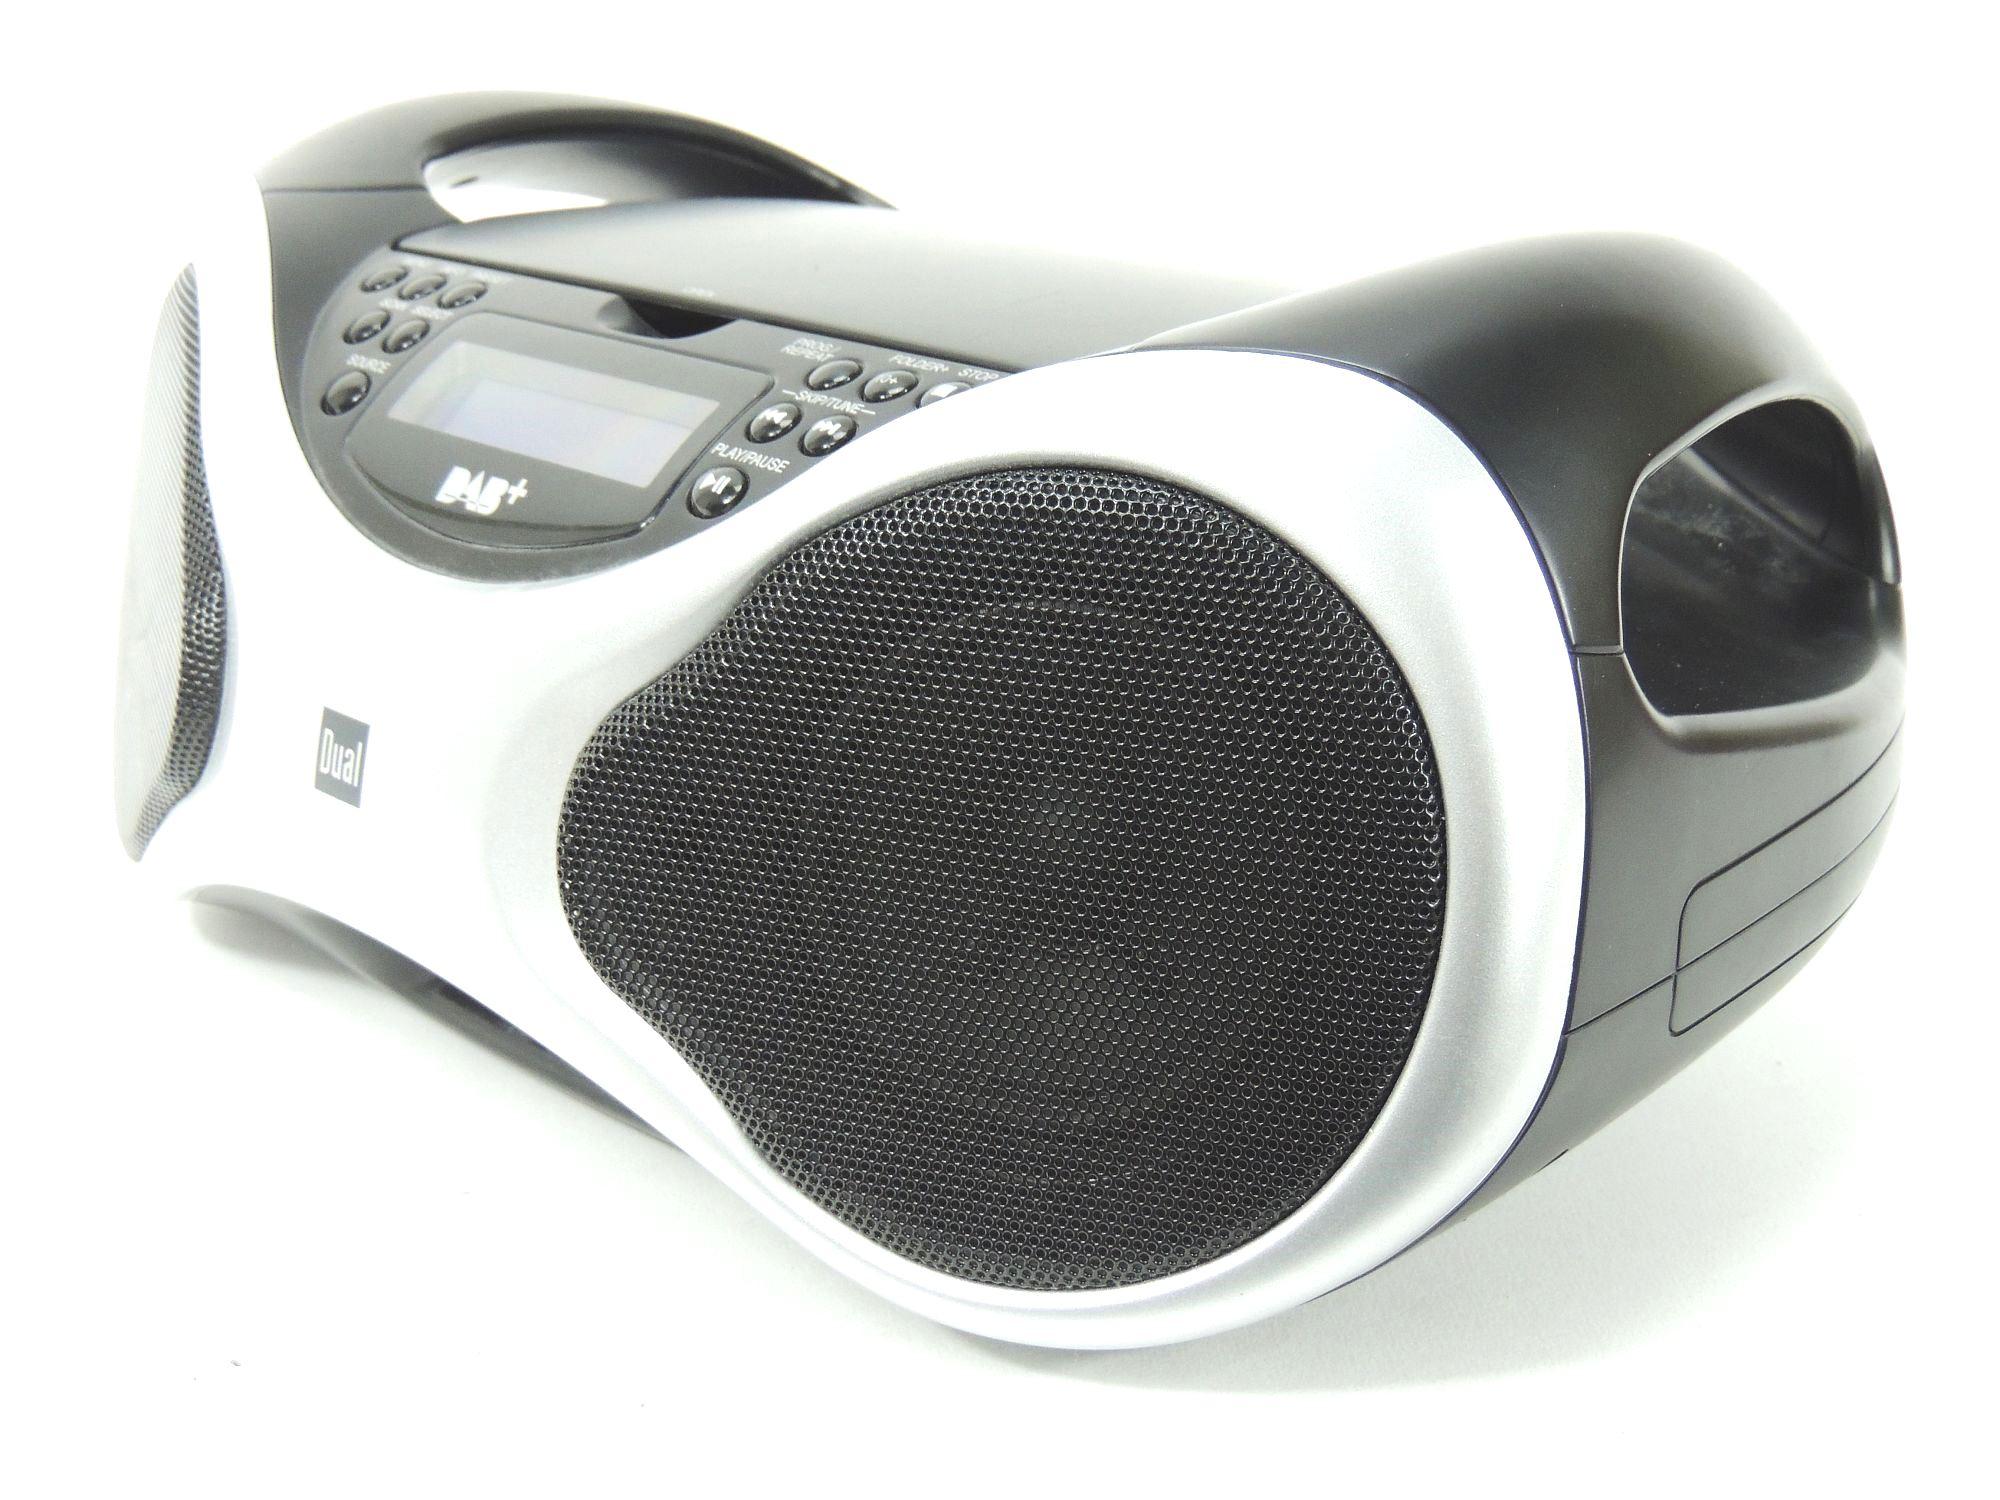 dual dab p 100 portable digitalradio boombox dab radio. Black Bedroom Furniture Sets. Home Design Ideas